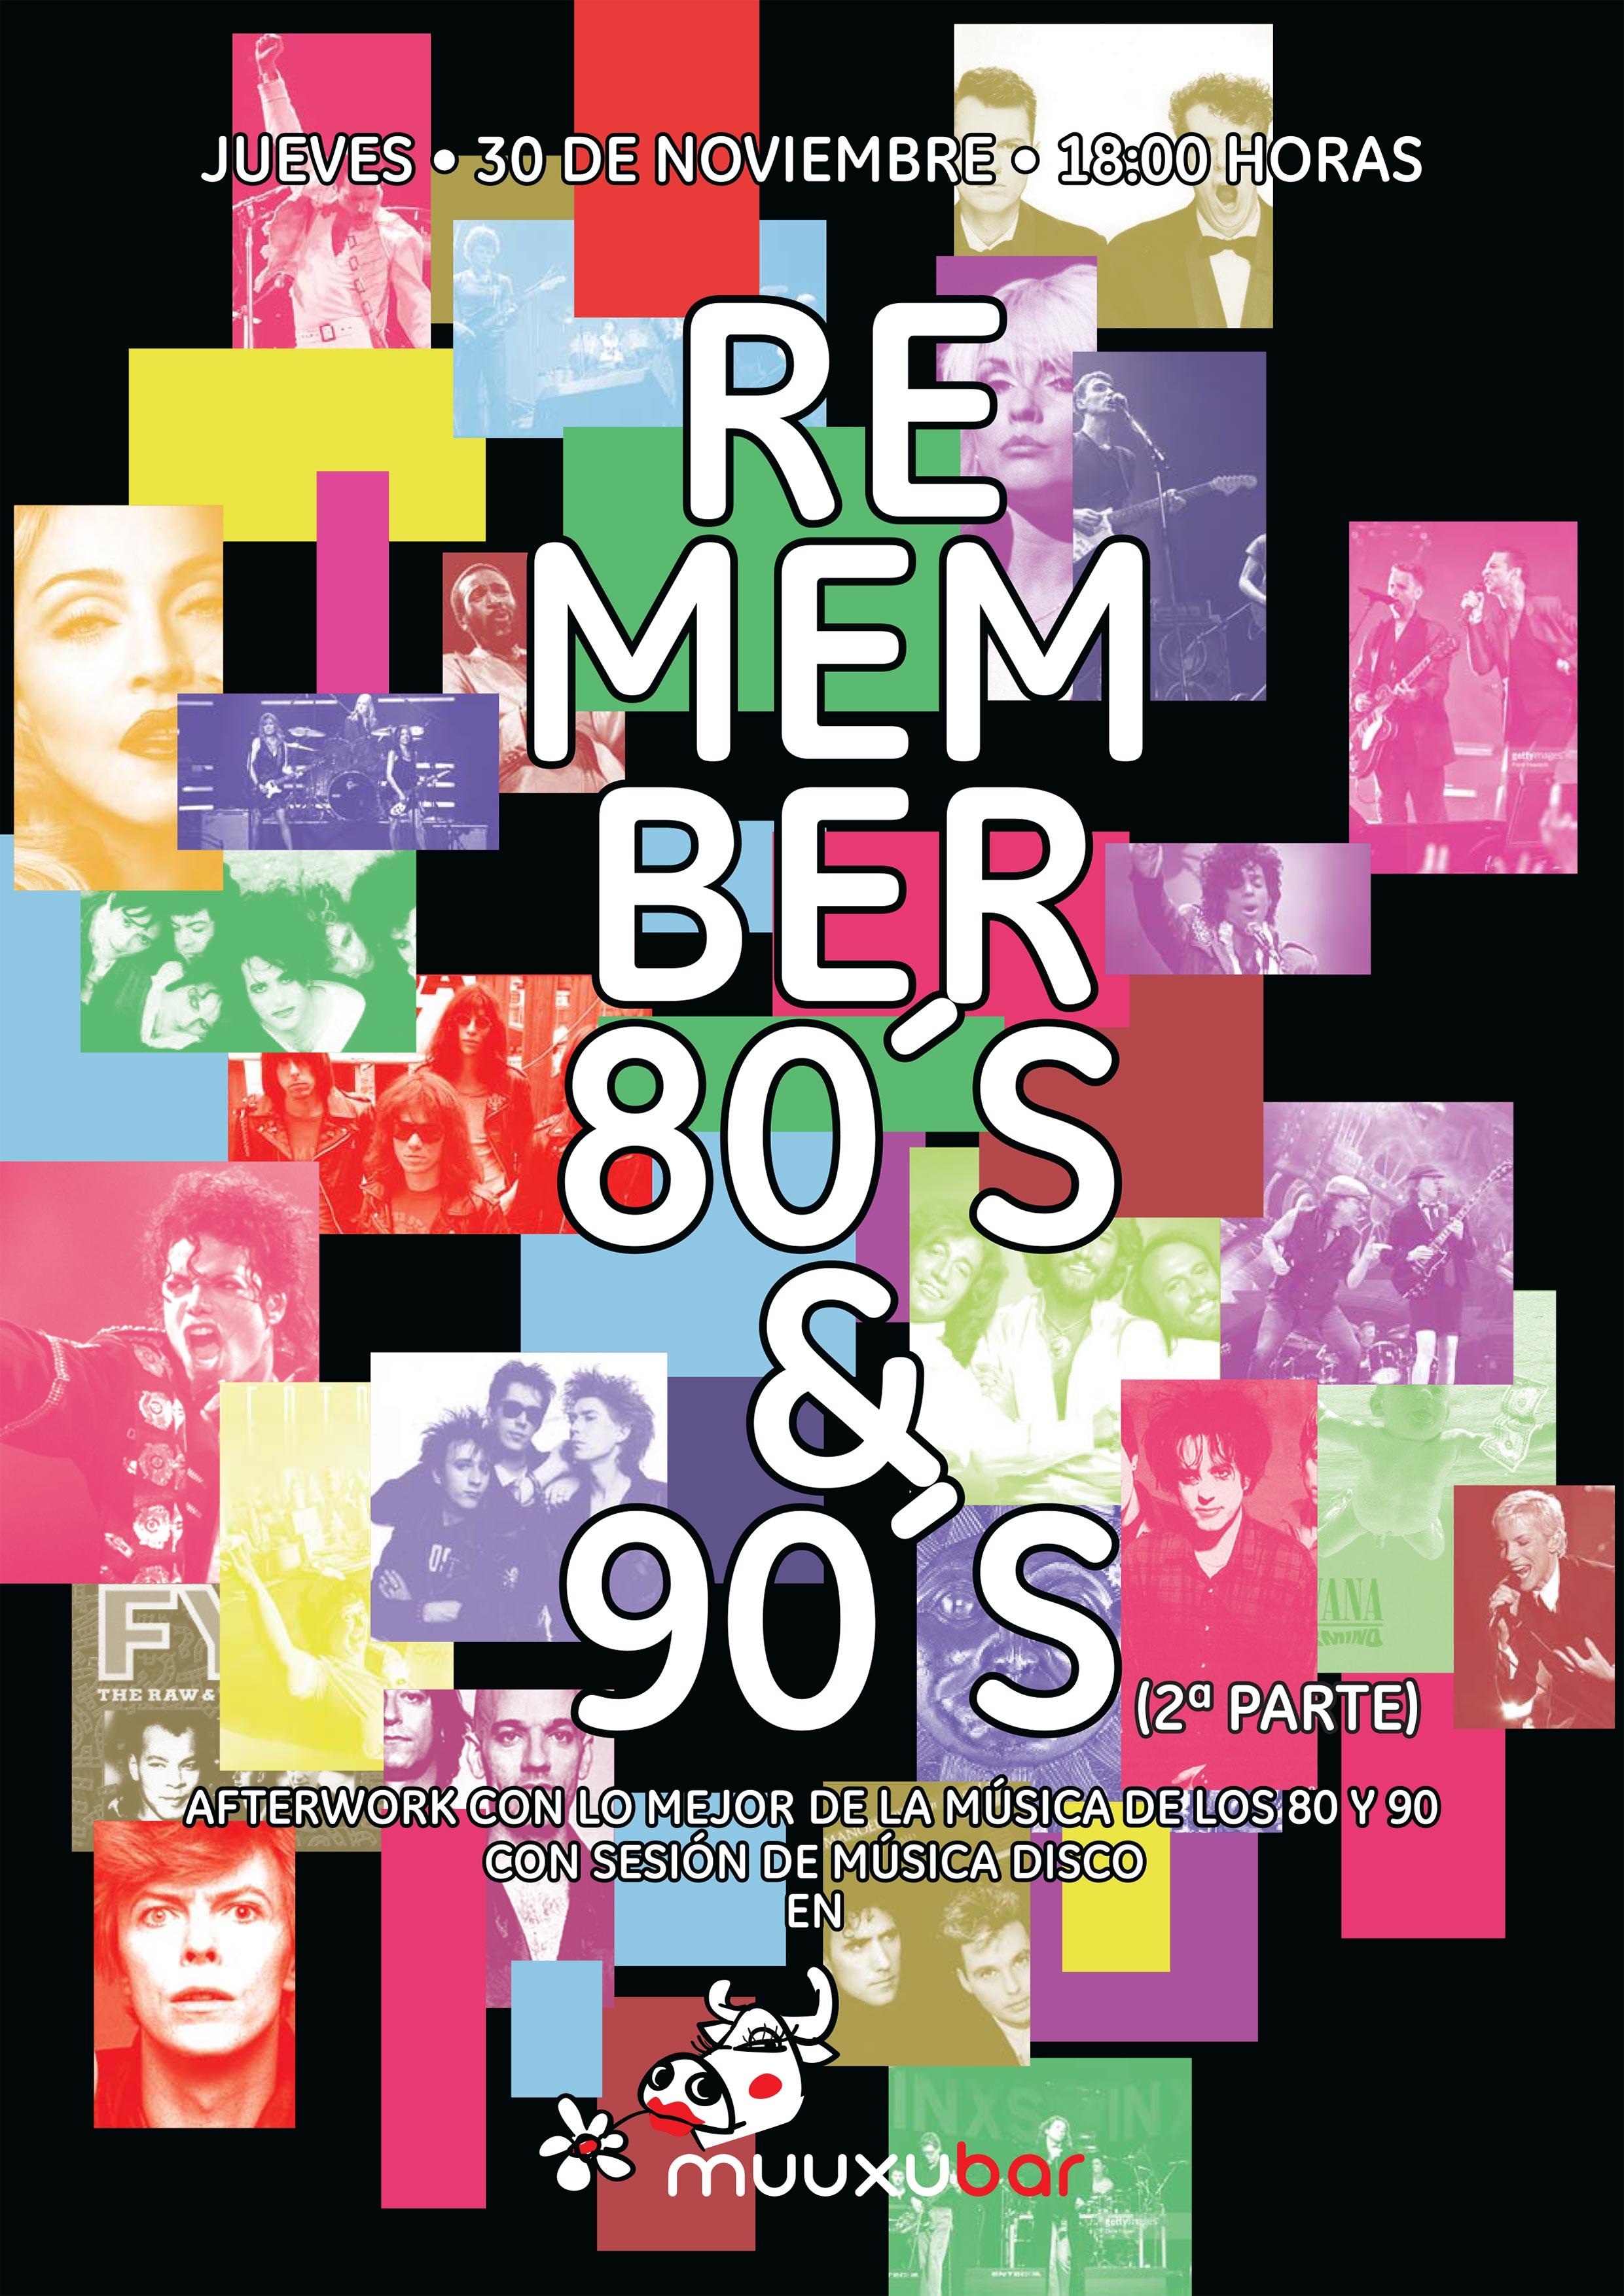 Happy hour *REMEMBER 80'S & 90'S* - Muuxubar